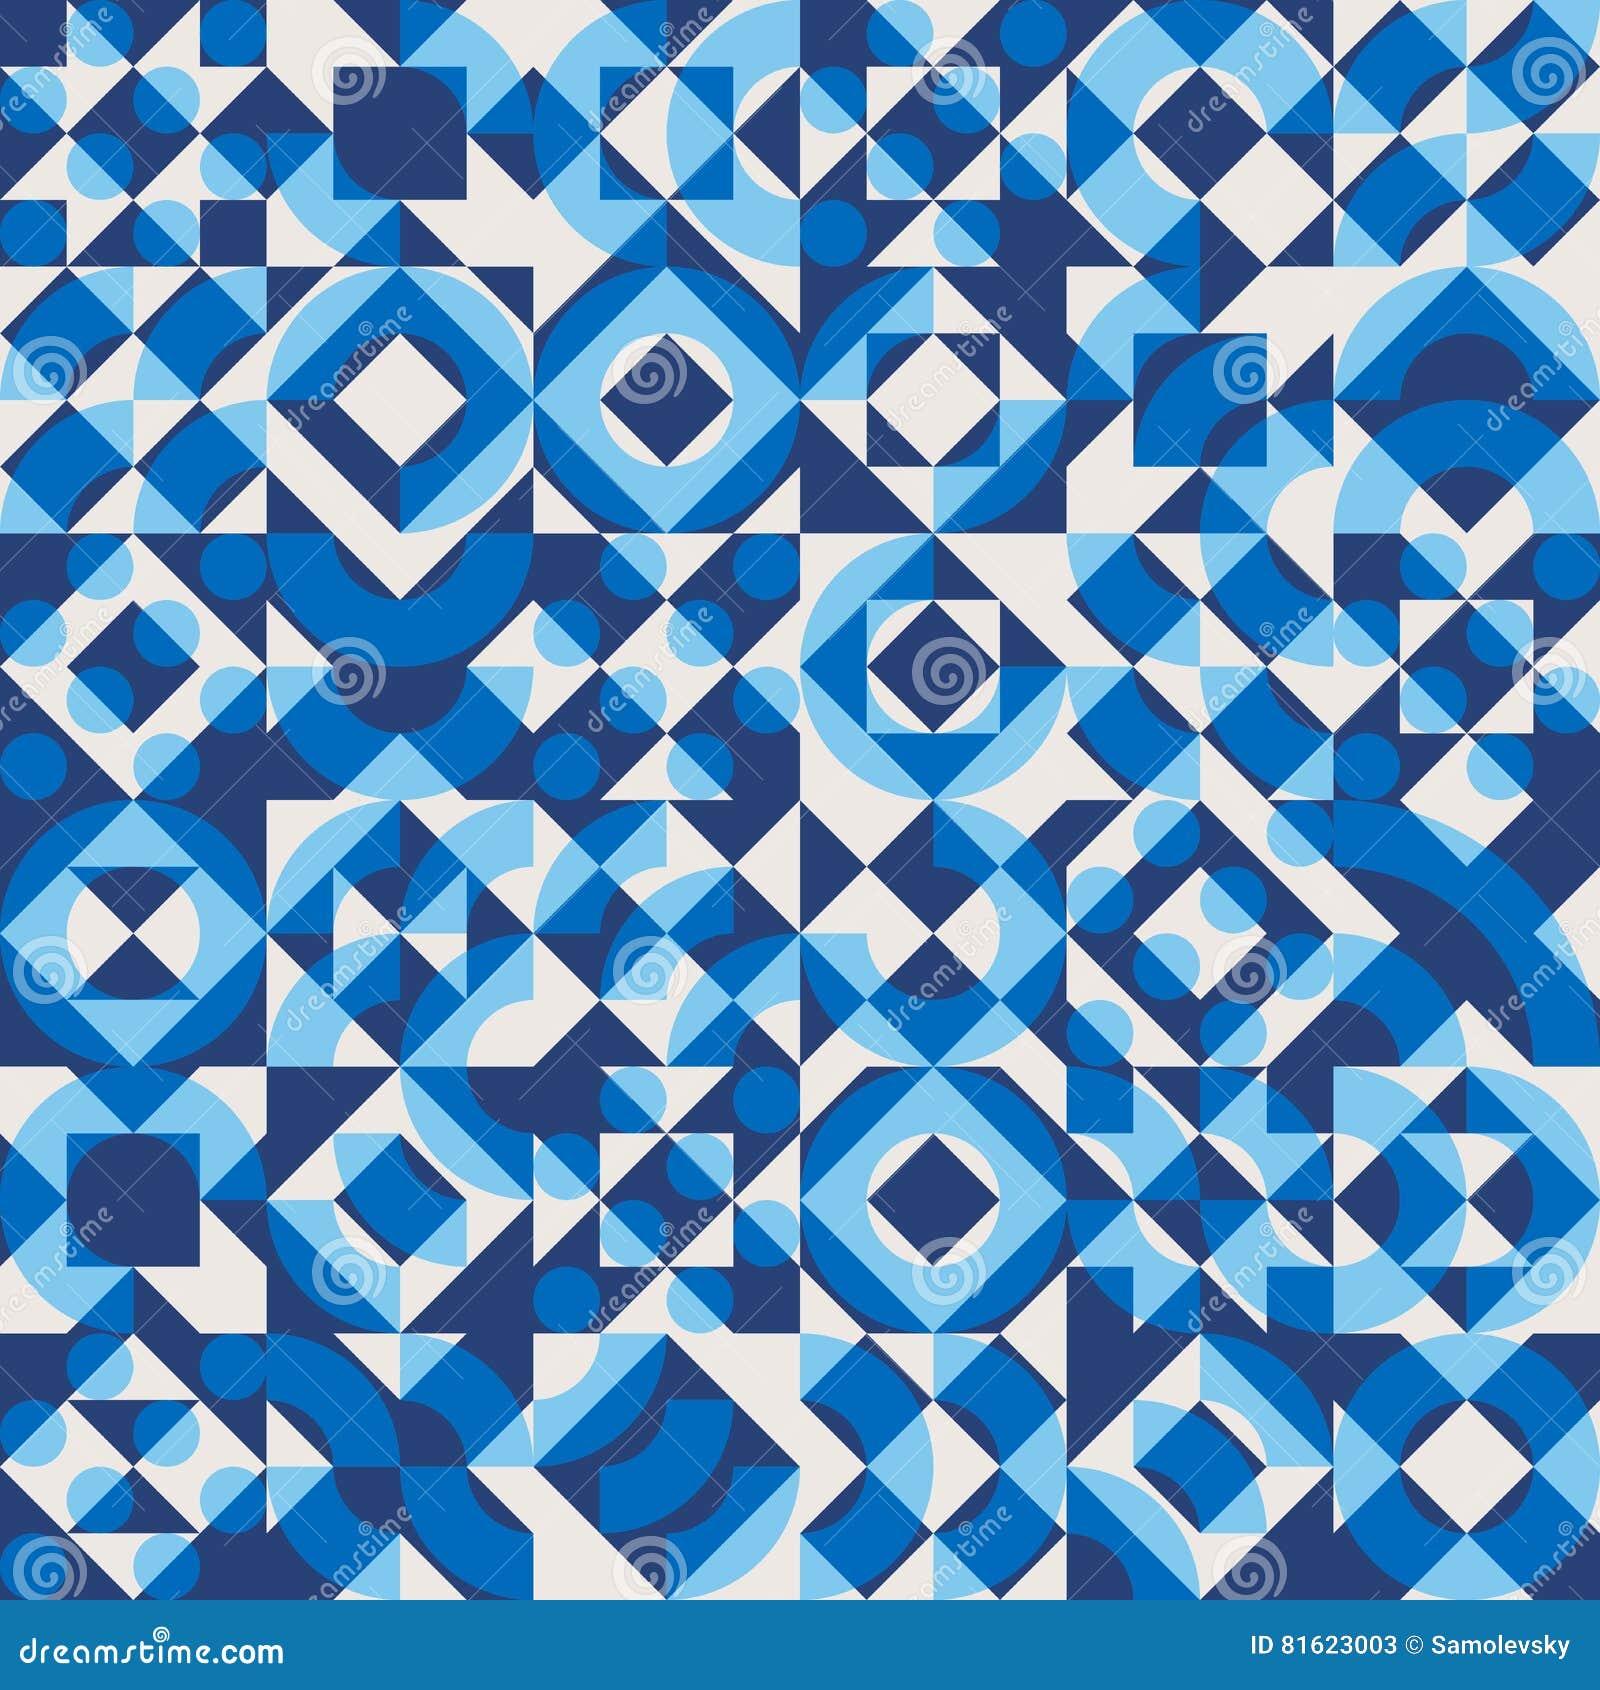 vector seamless navy blue color overlay irregular geometric blocks